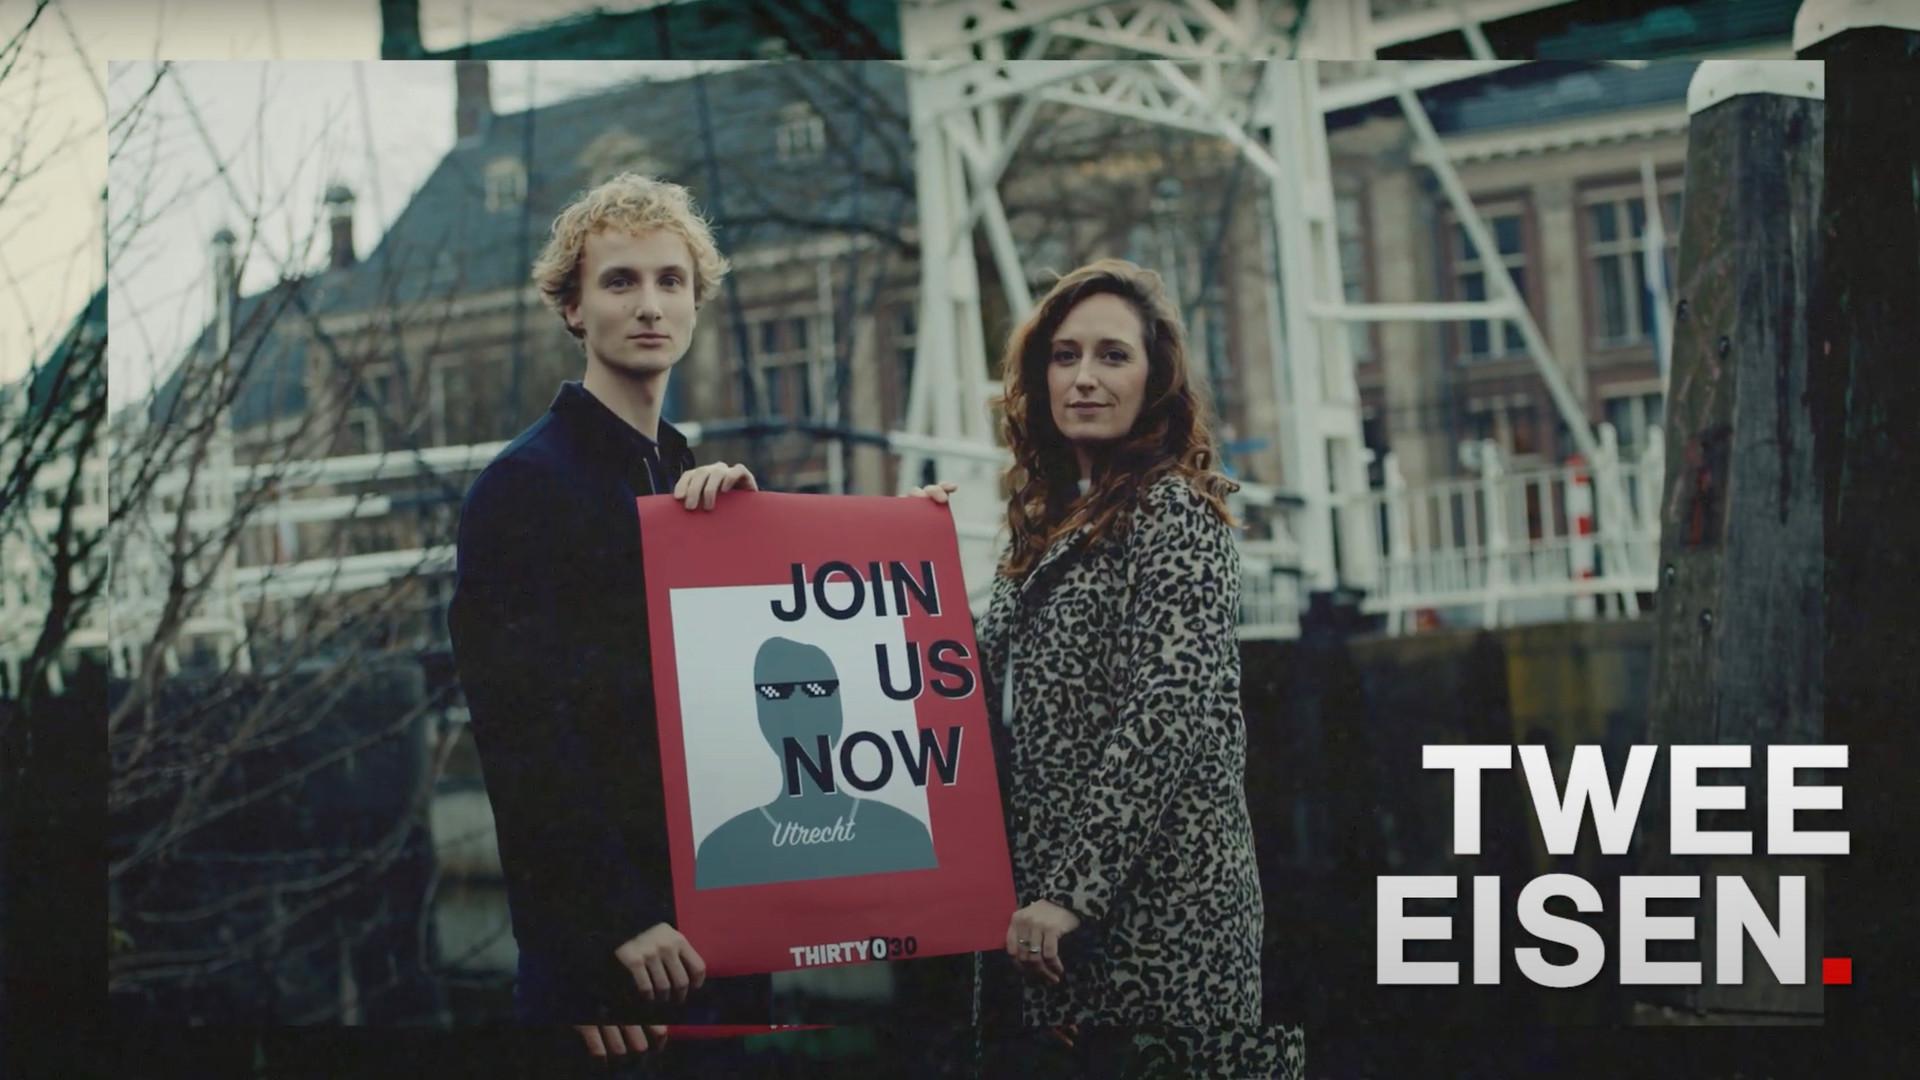 Freelance regisseur / creative Thomas Endeman | Utrecht